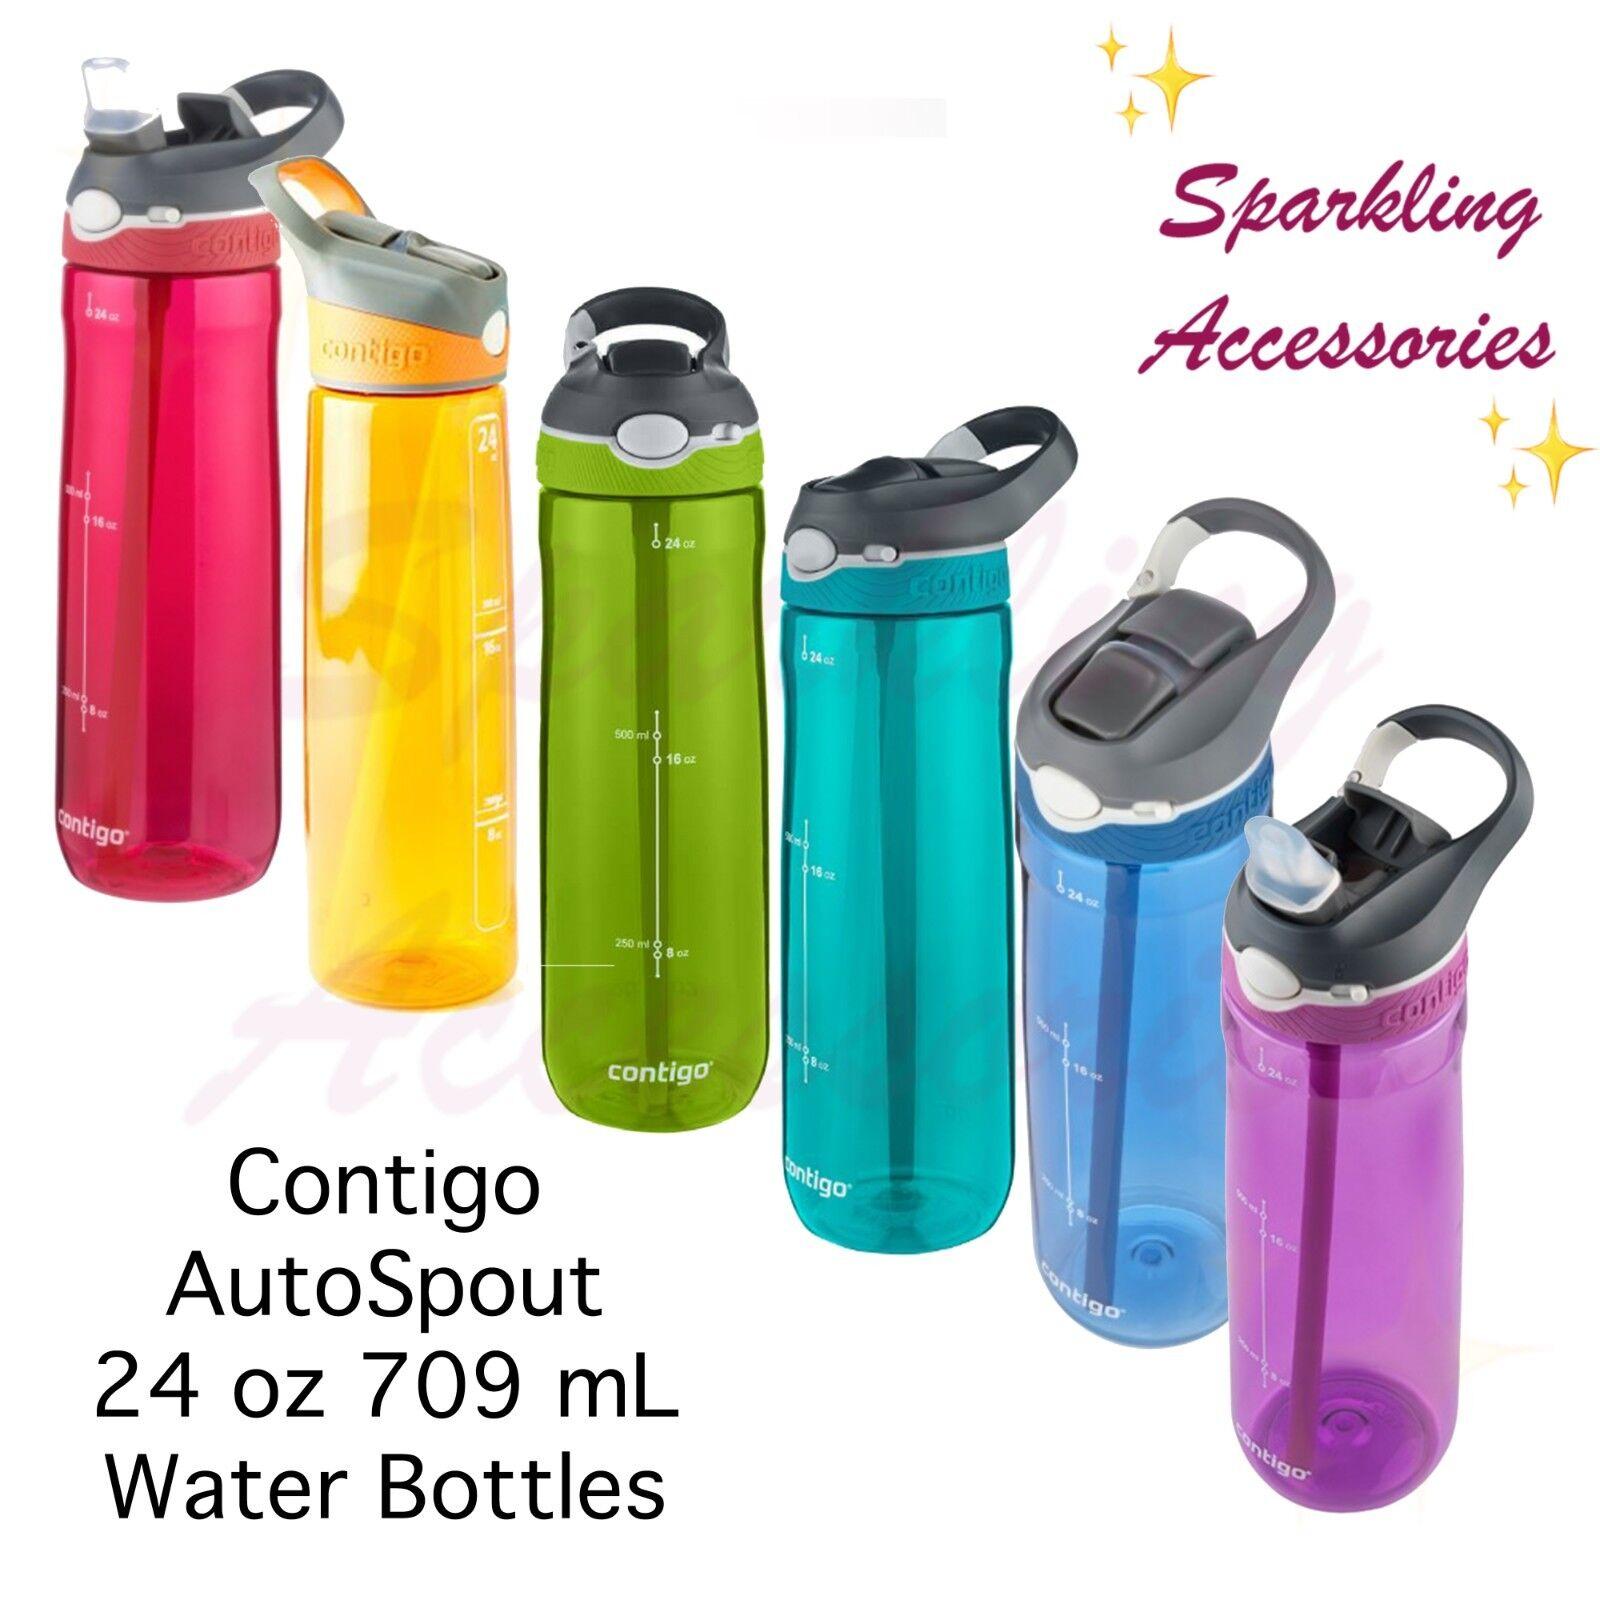 BRAND NEW 2 x Contigo Autospout Drink Water Bottle 709mL Stormy Blue Double Set!